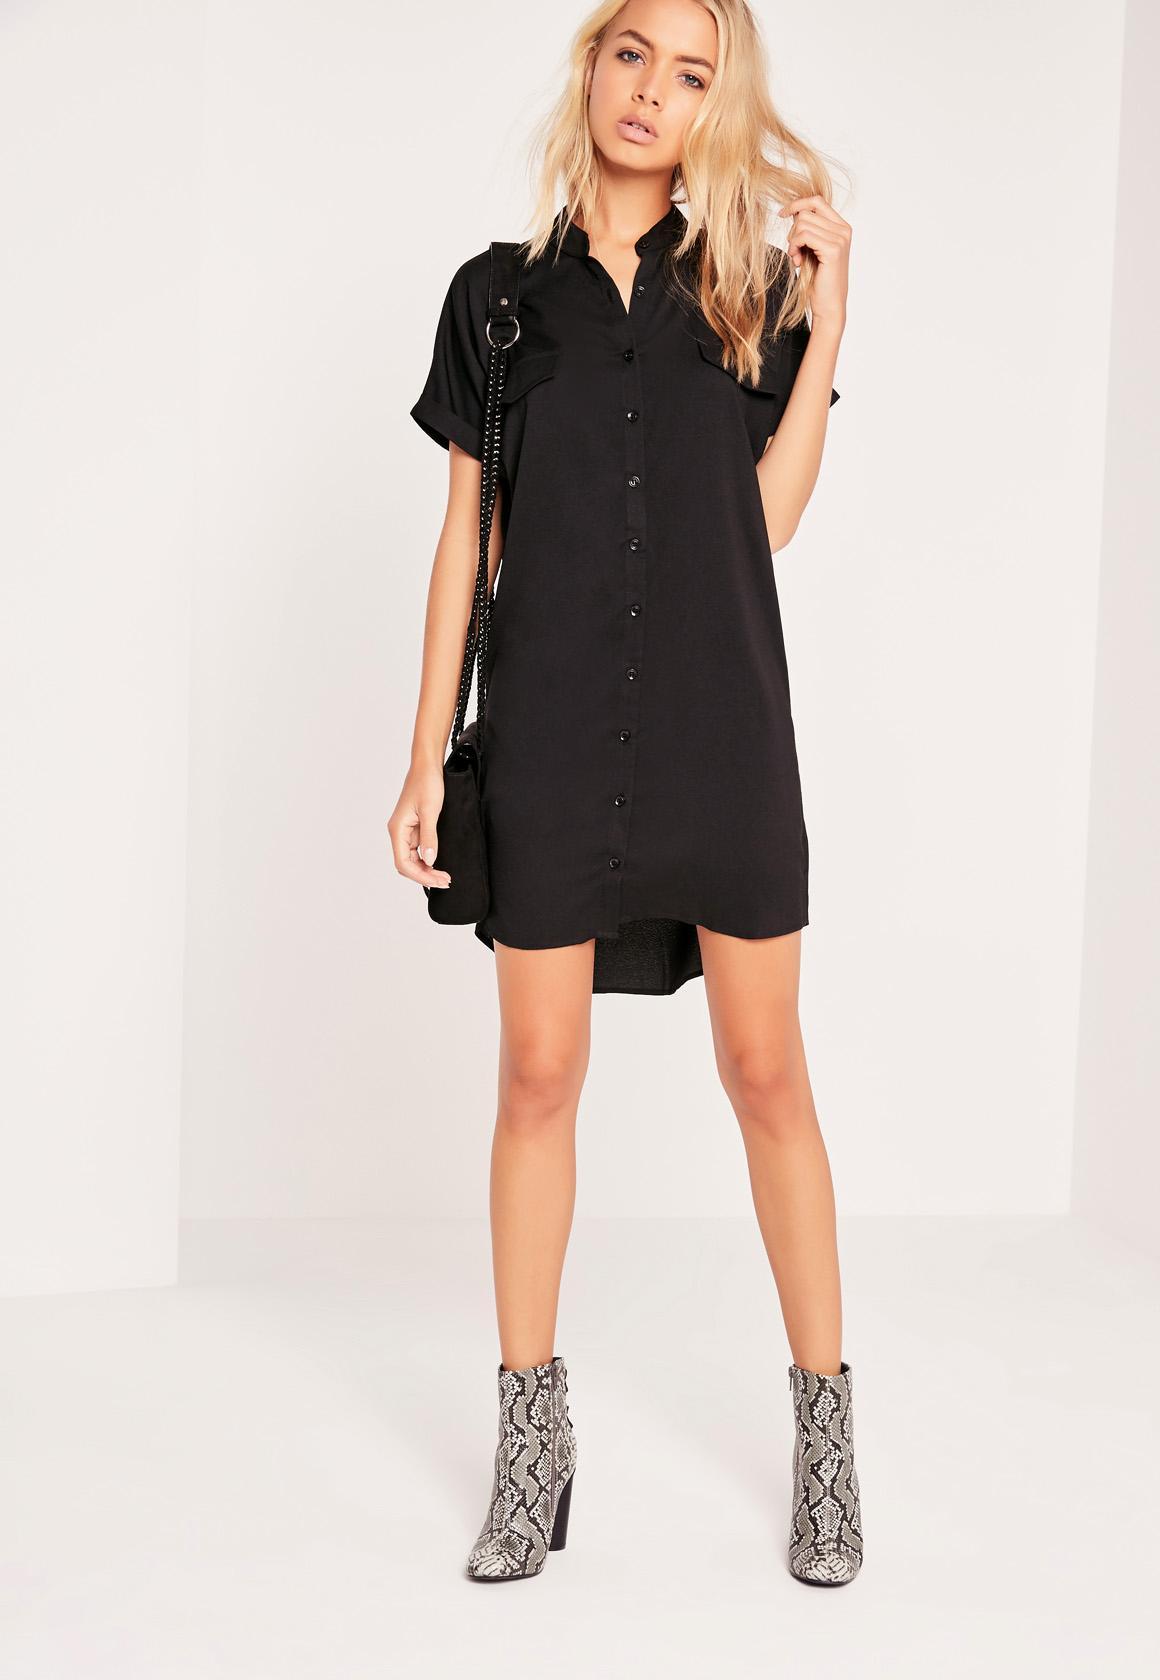 Short Sleeve Pocket Shirt Dress Black